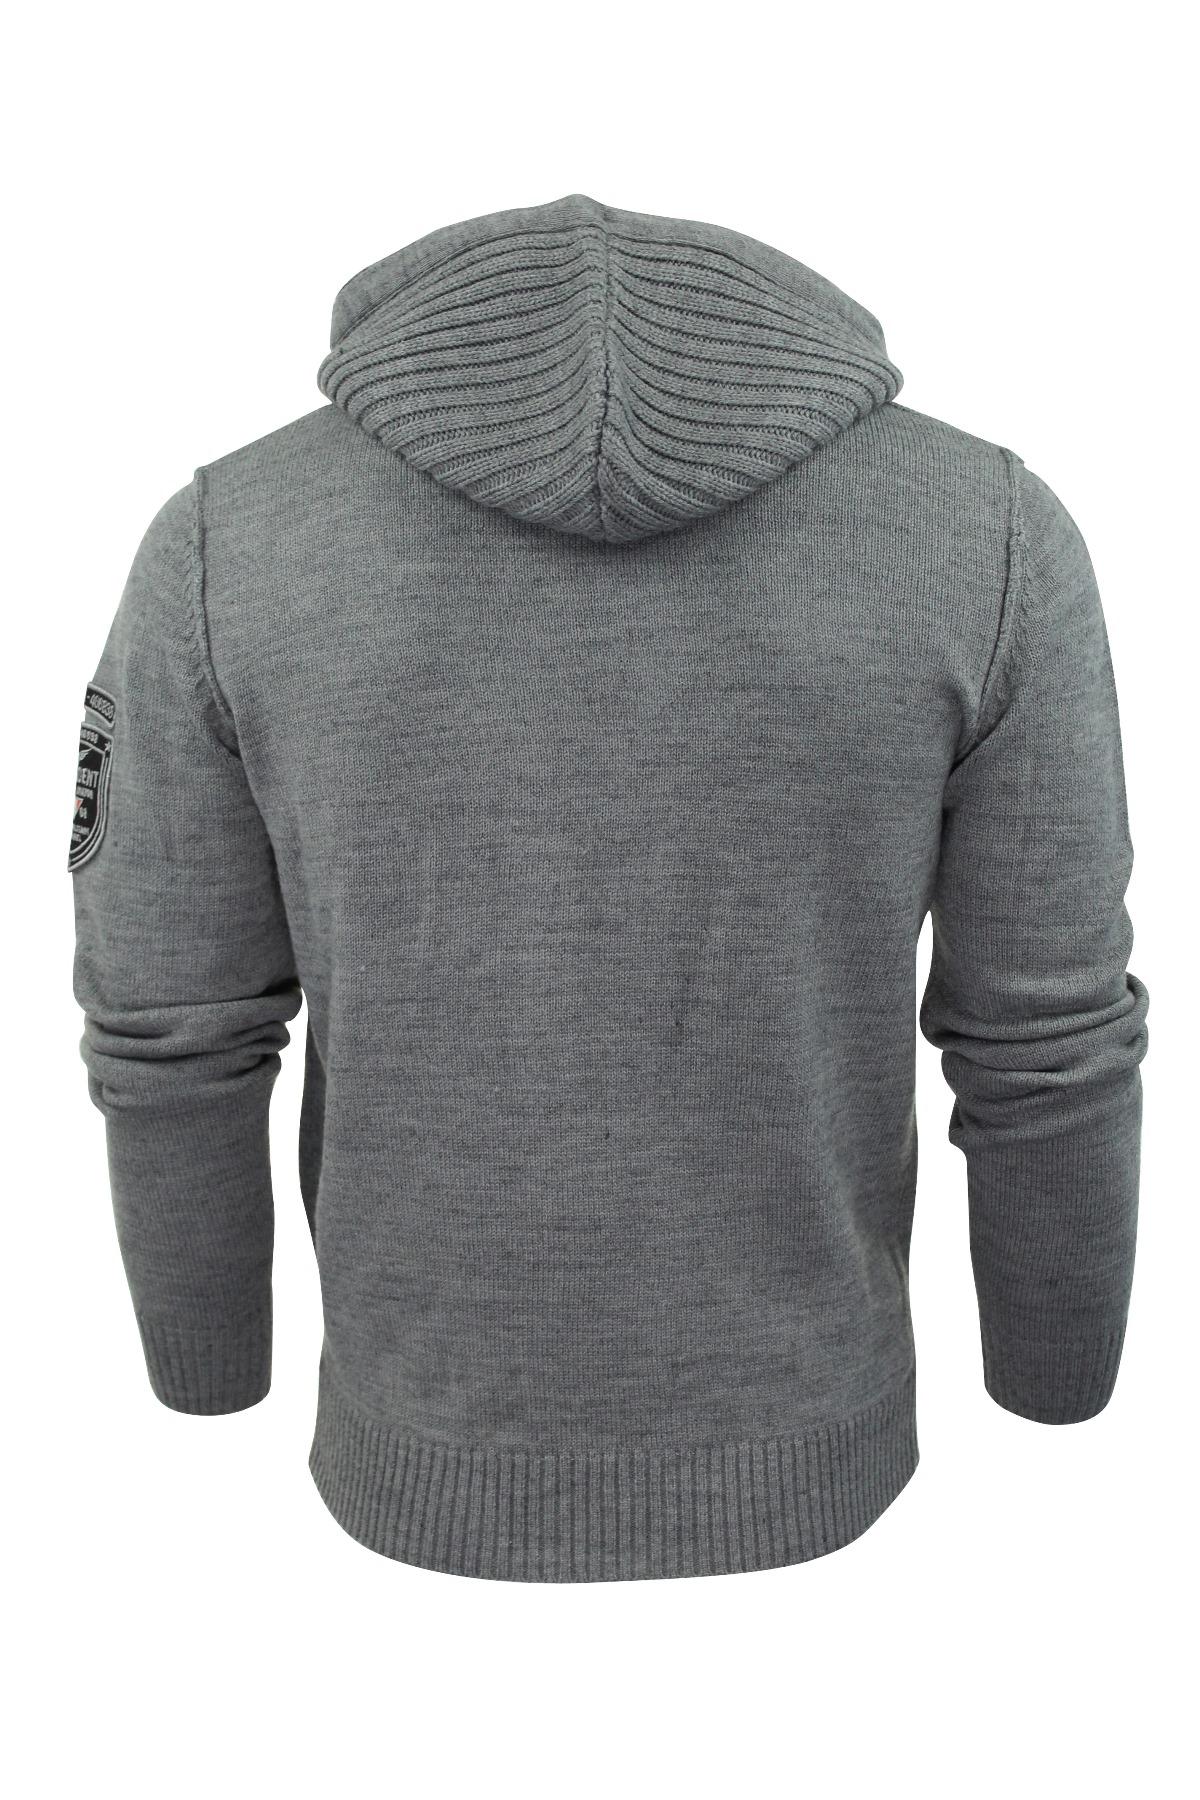 Mens Cardigan Jumper Dissident 'Cruise' Wool Mix Knit | eBay